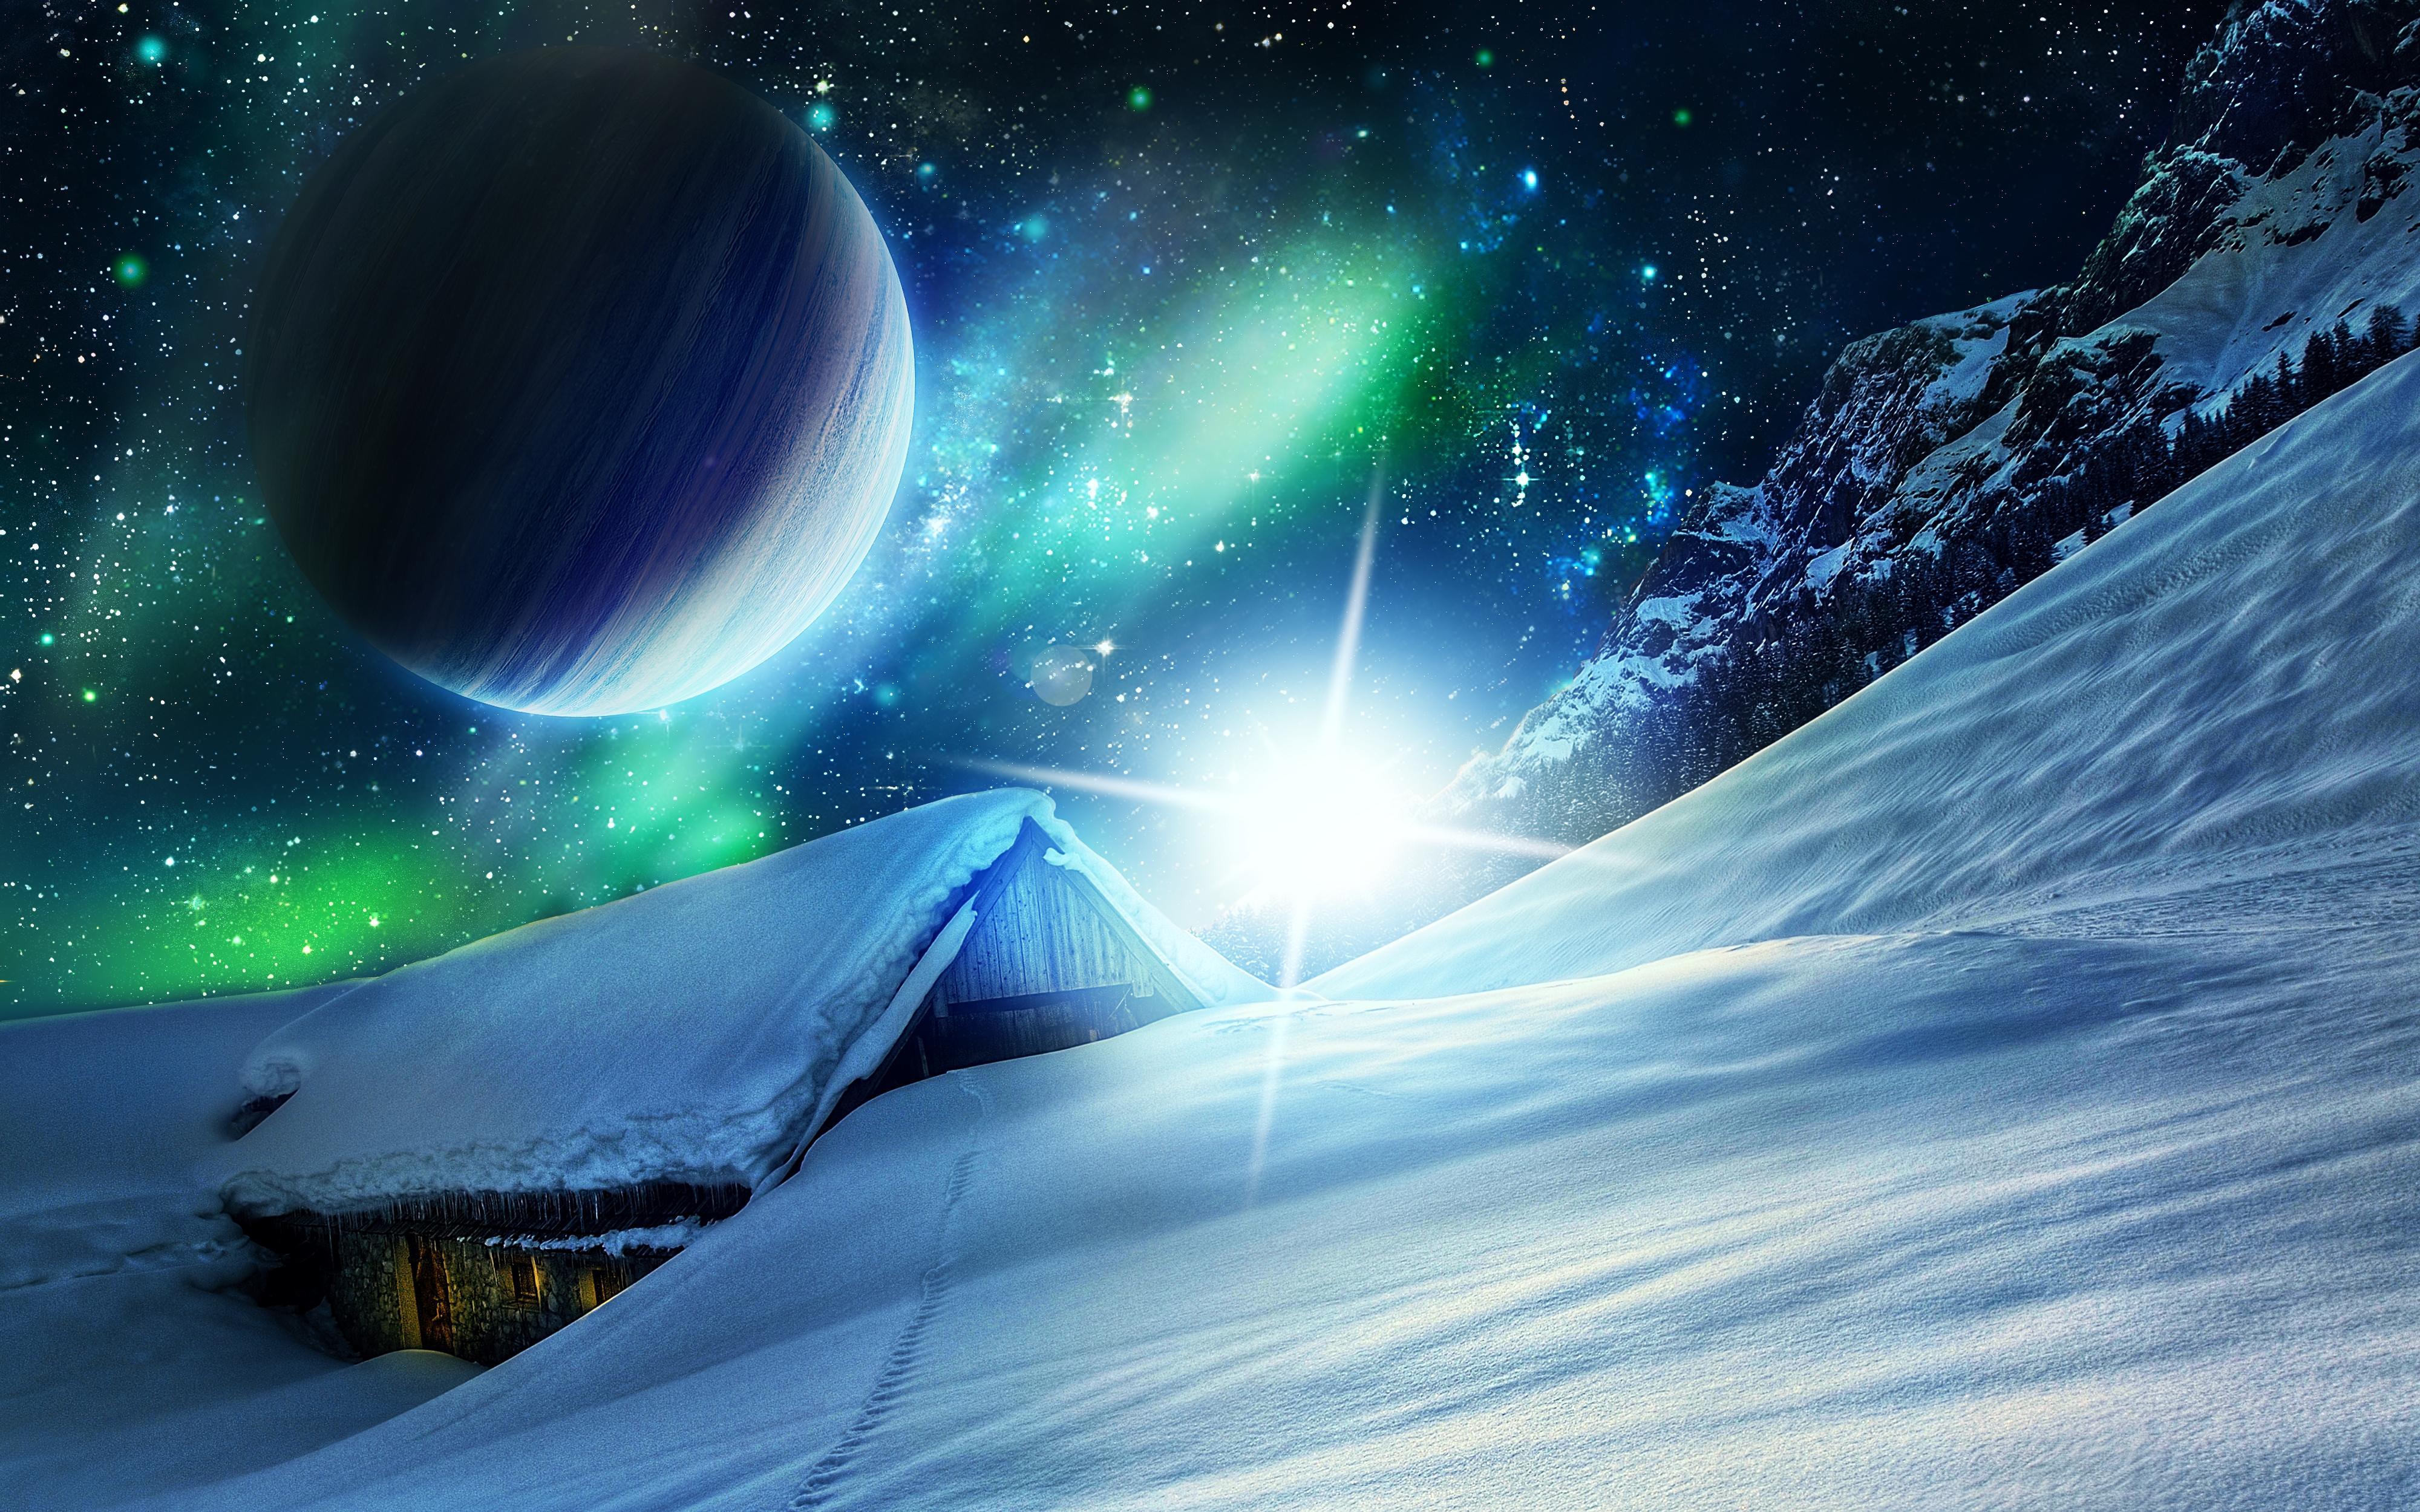 обои зима, горы, сияние, домик картинки фото